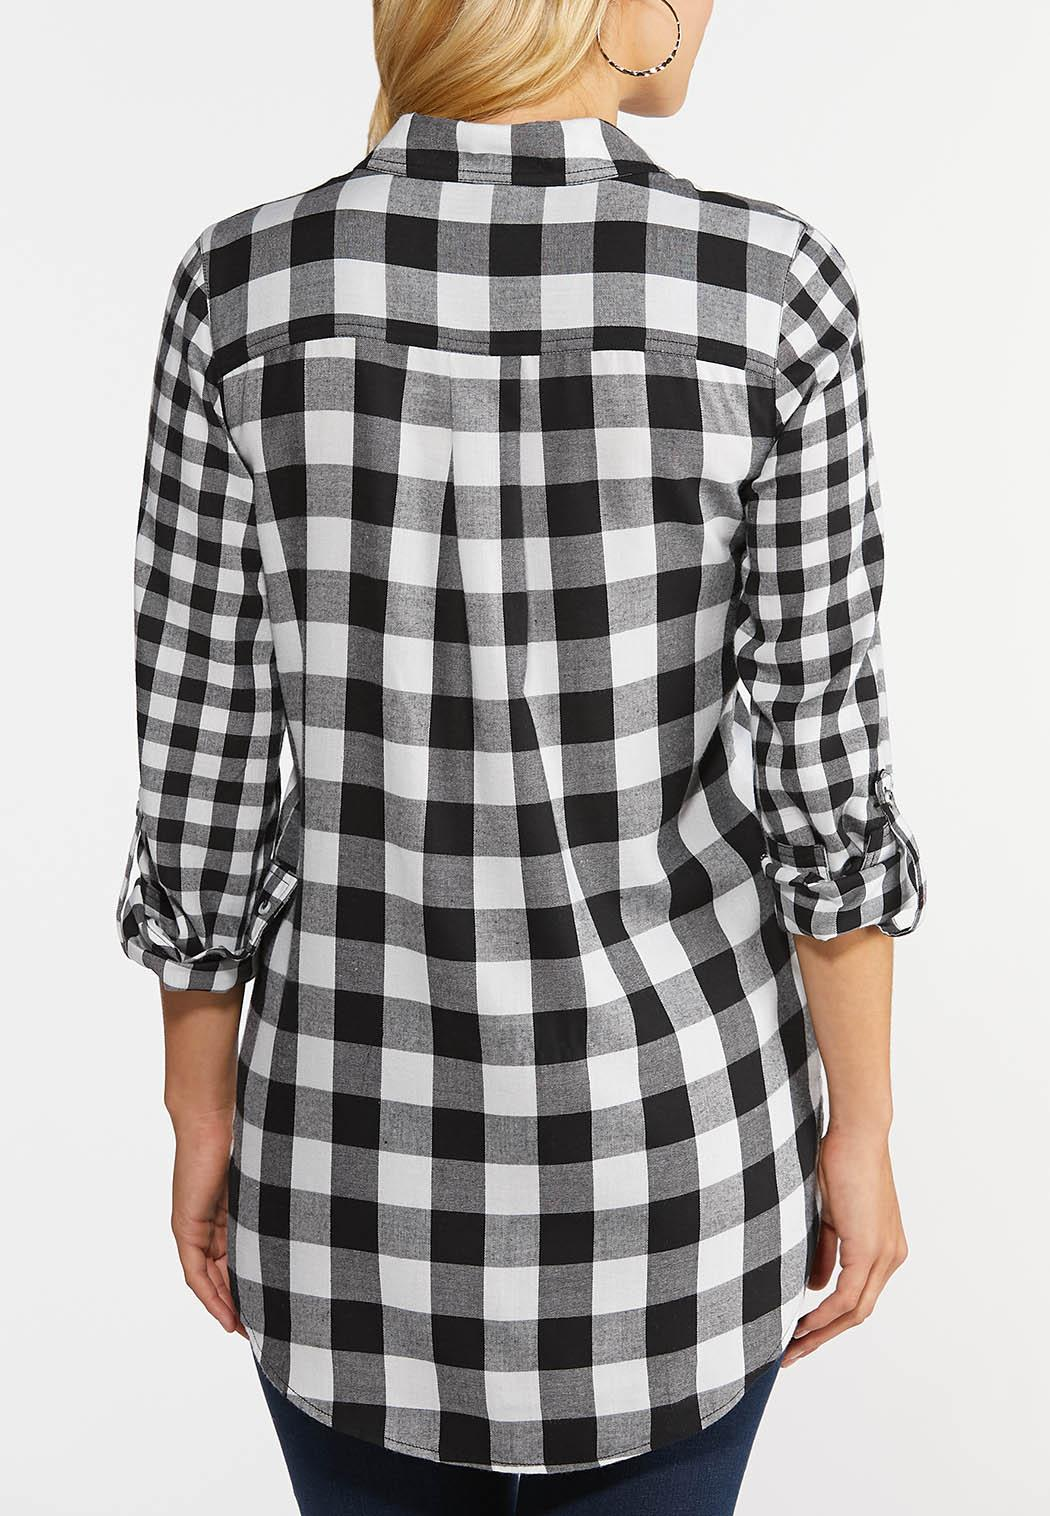 Black And White Plaid Shirt (Item #44366678)